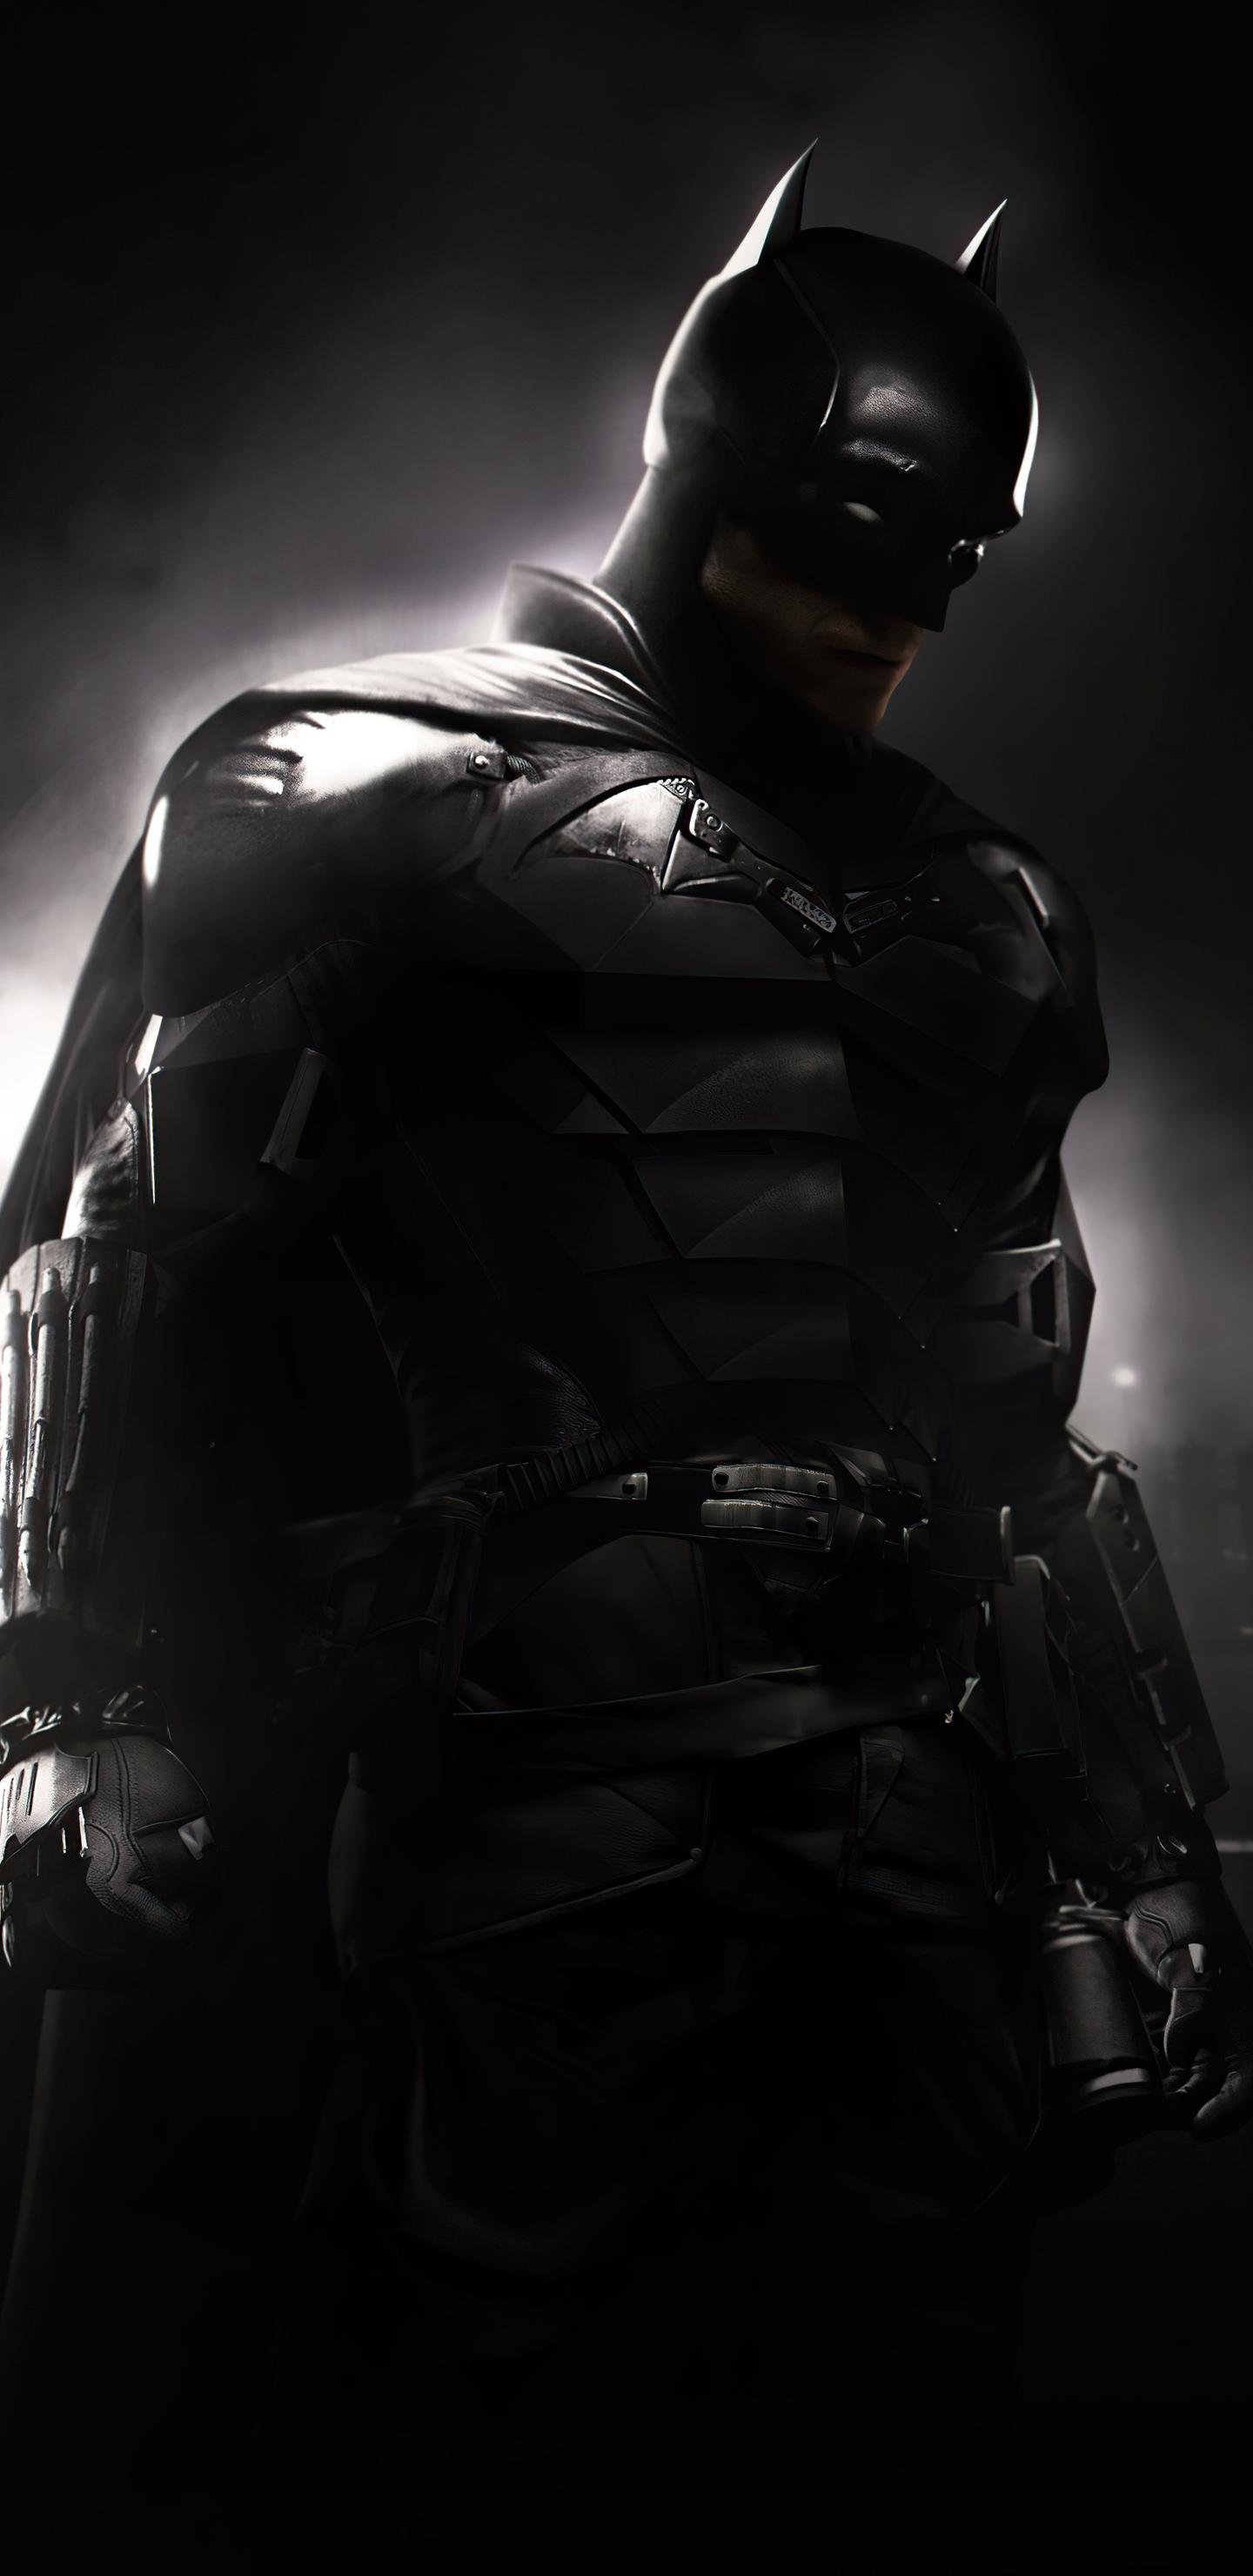 robert-pattinson-the-batman-suit-4k-oz.jpg